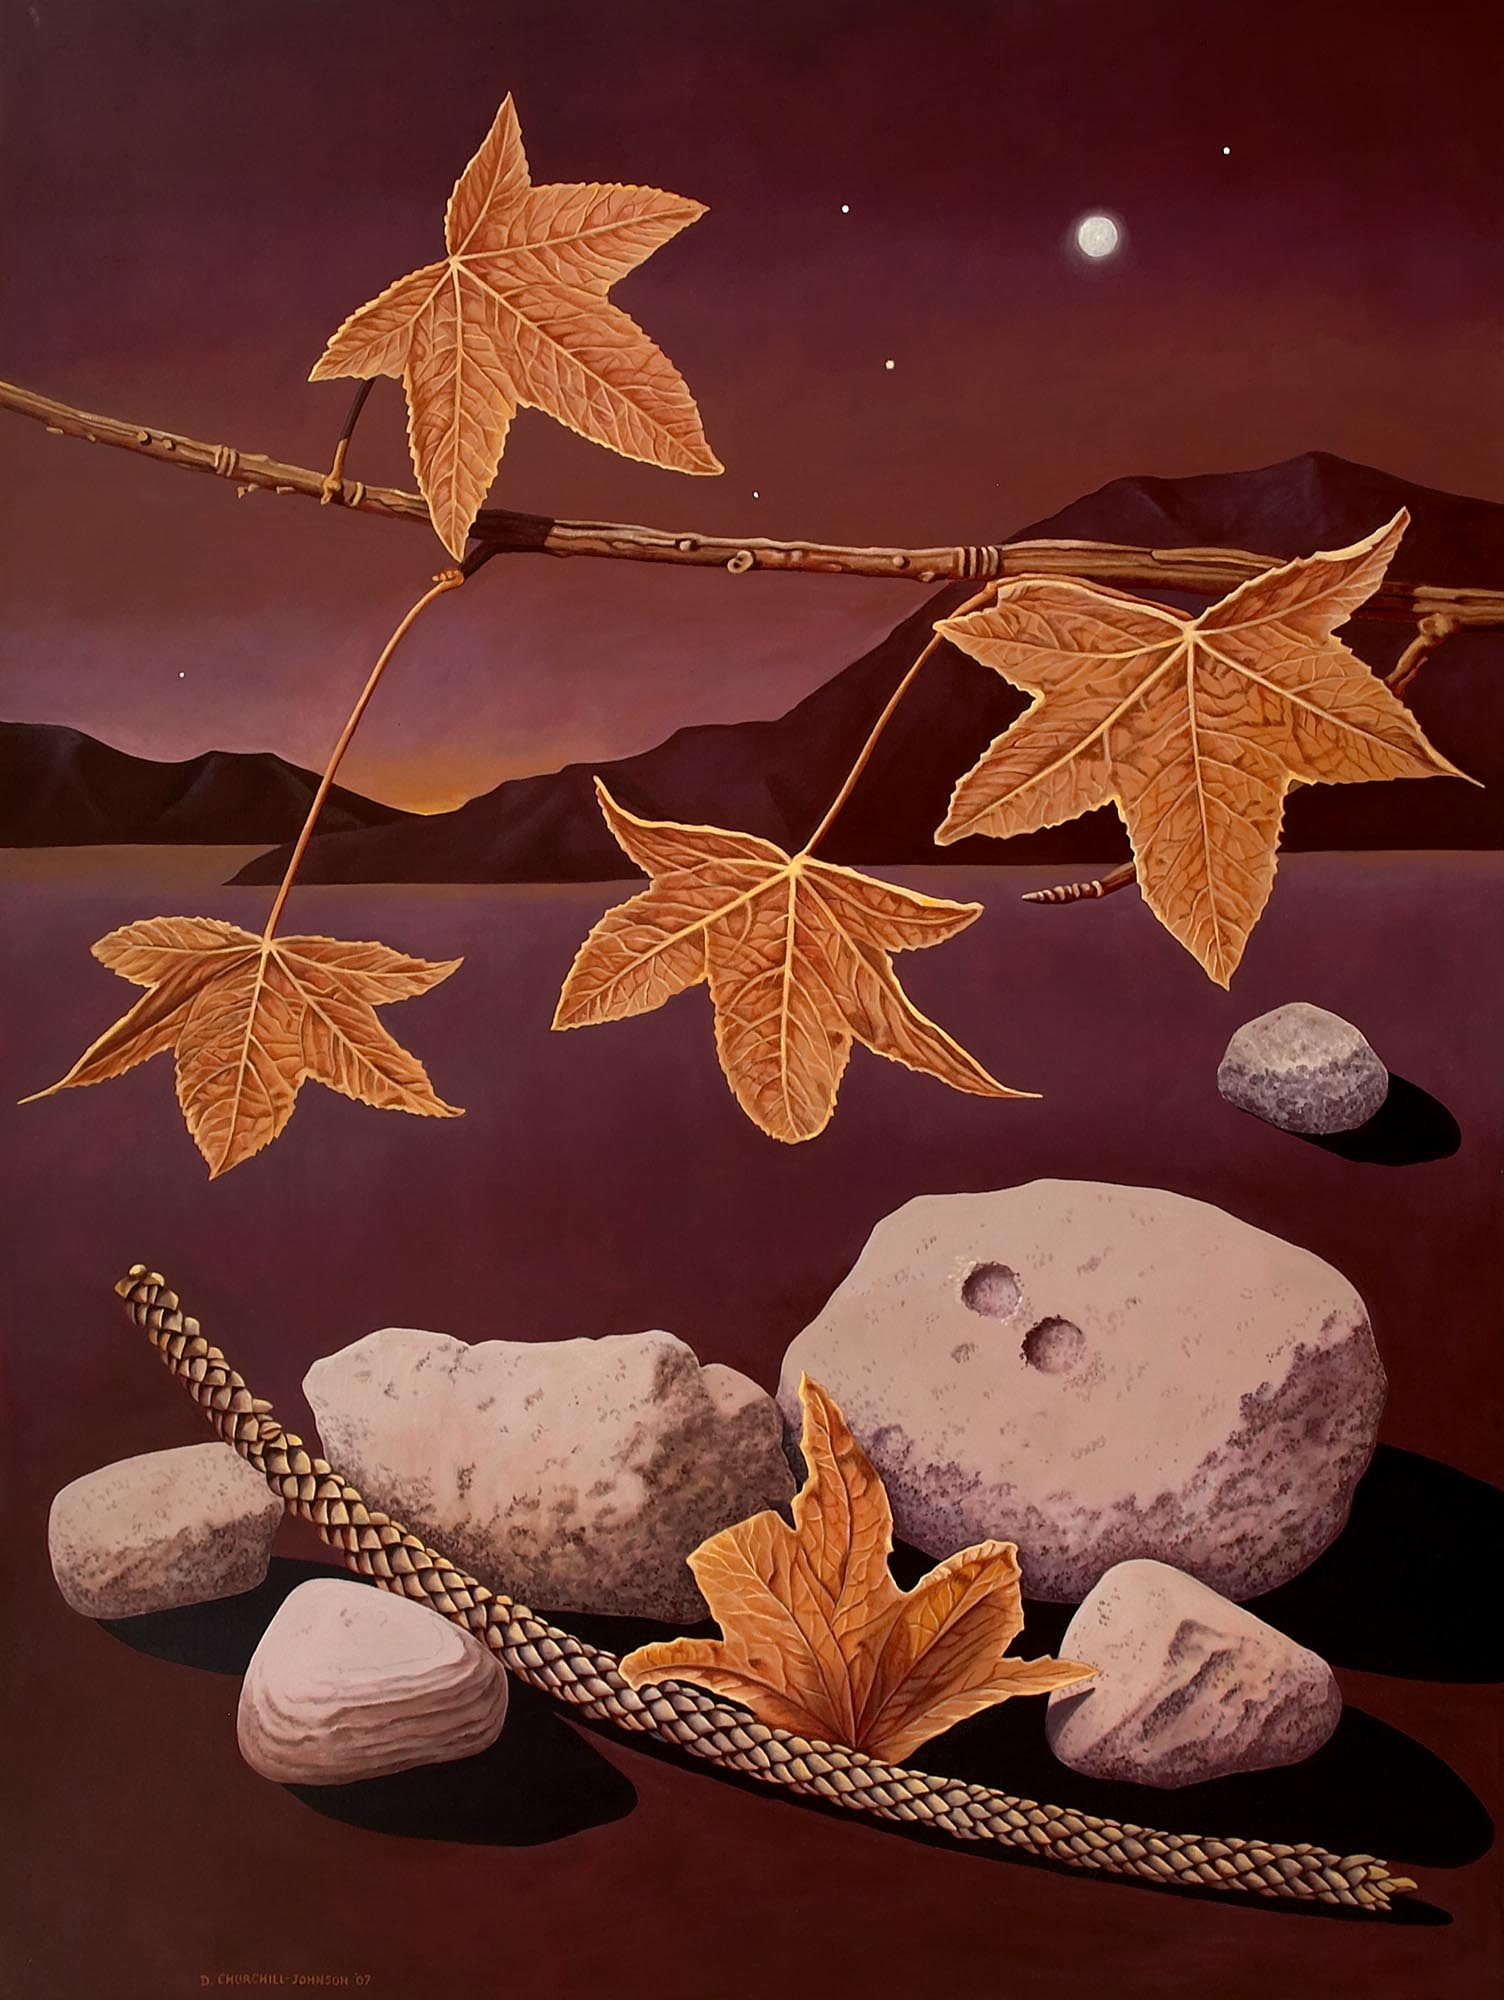 Falling Stars, 72 x 54 inches